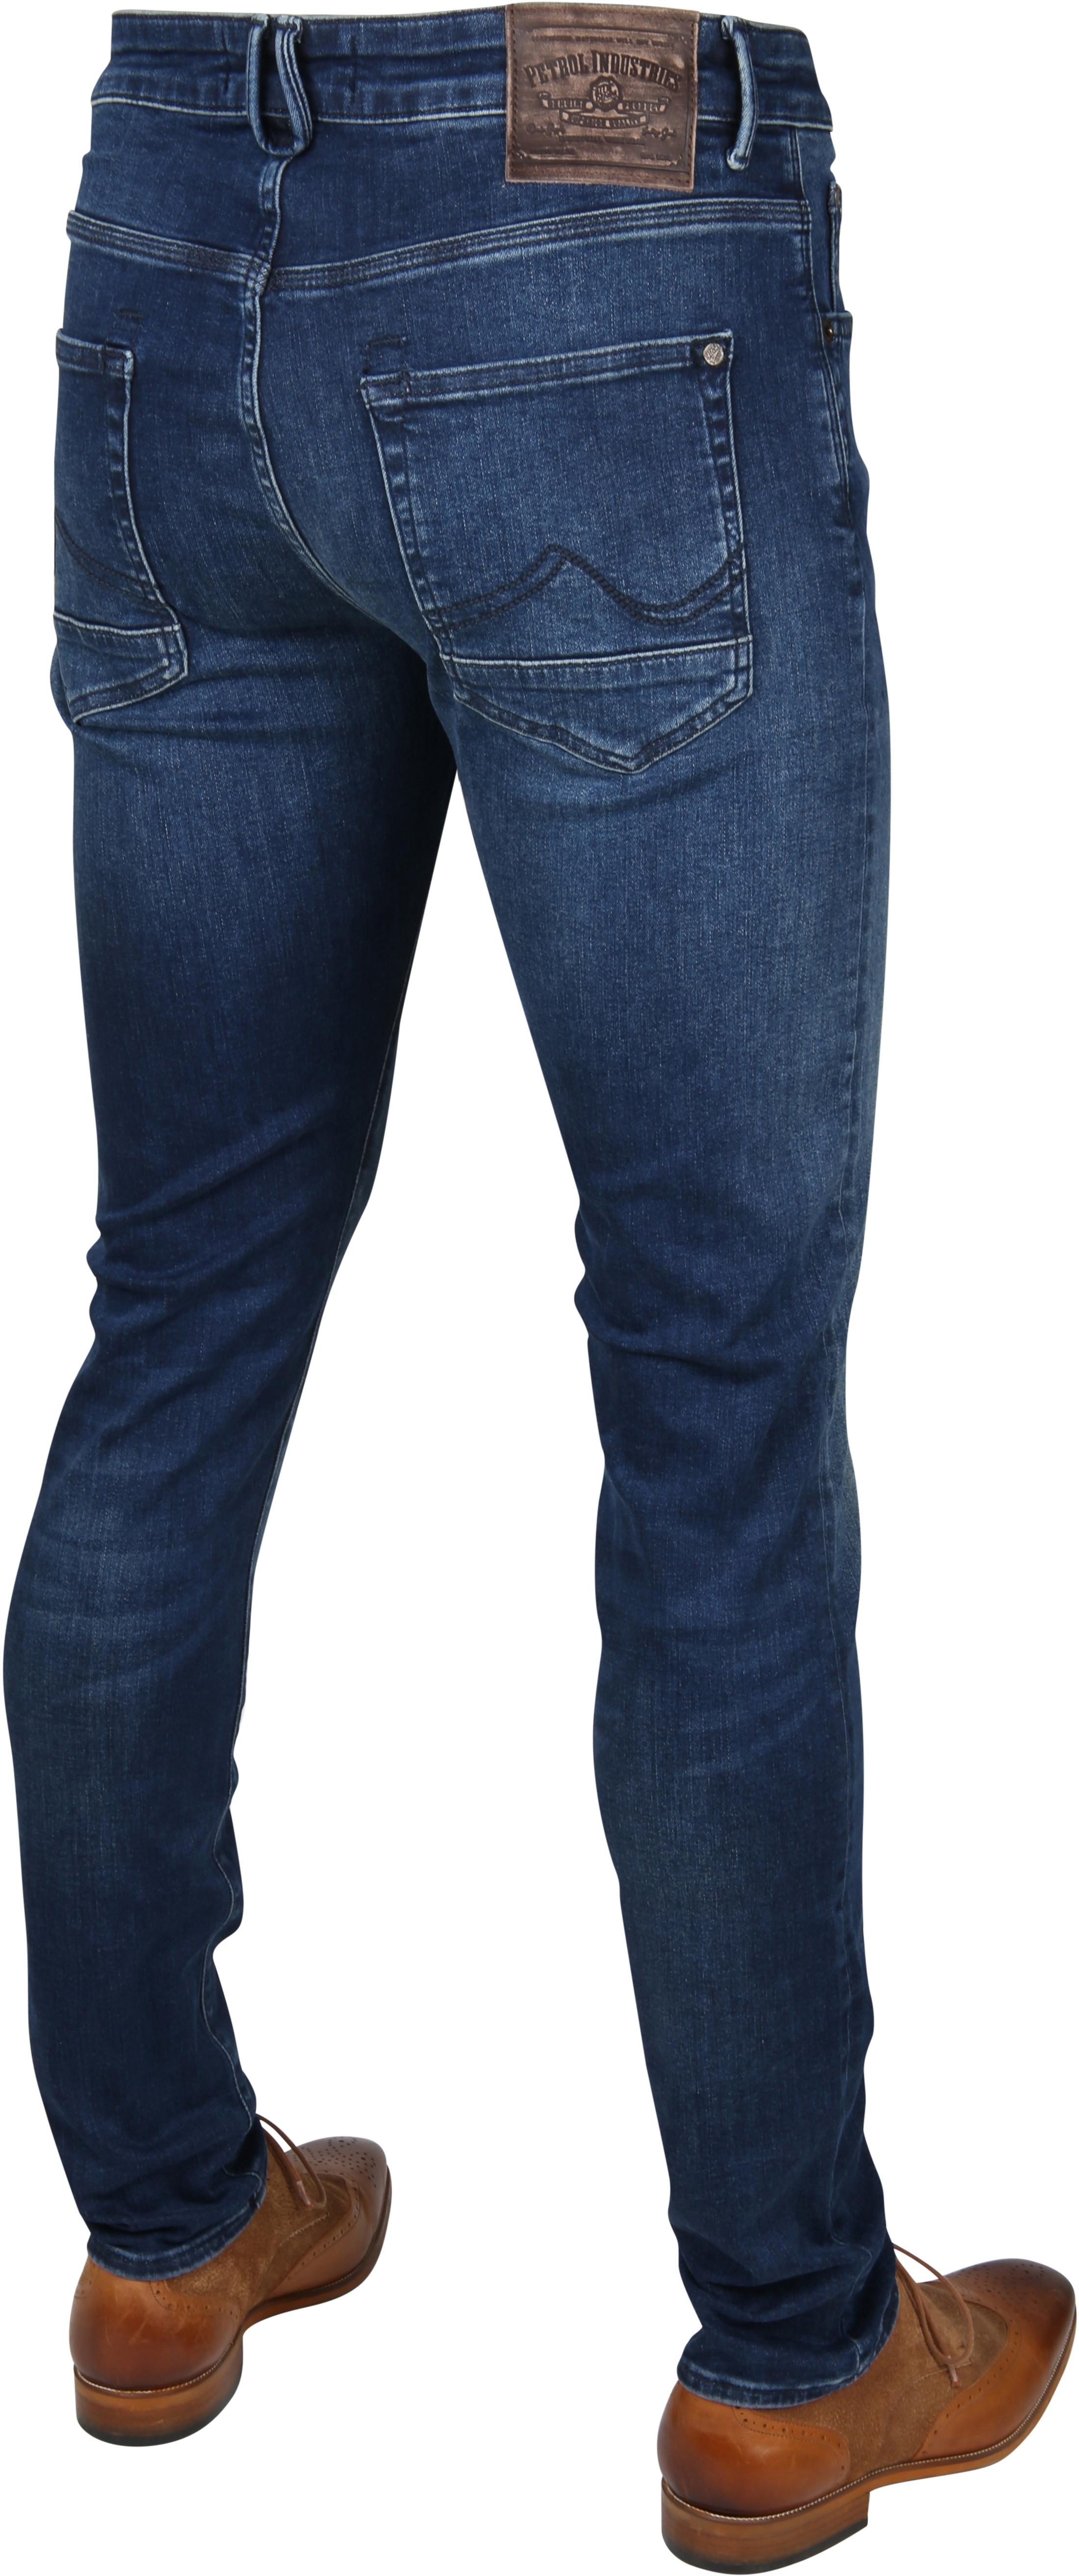 Petrol Seaham Jeans Blau Foto 3